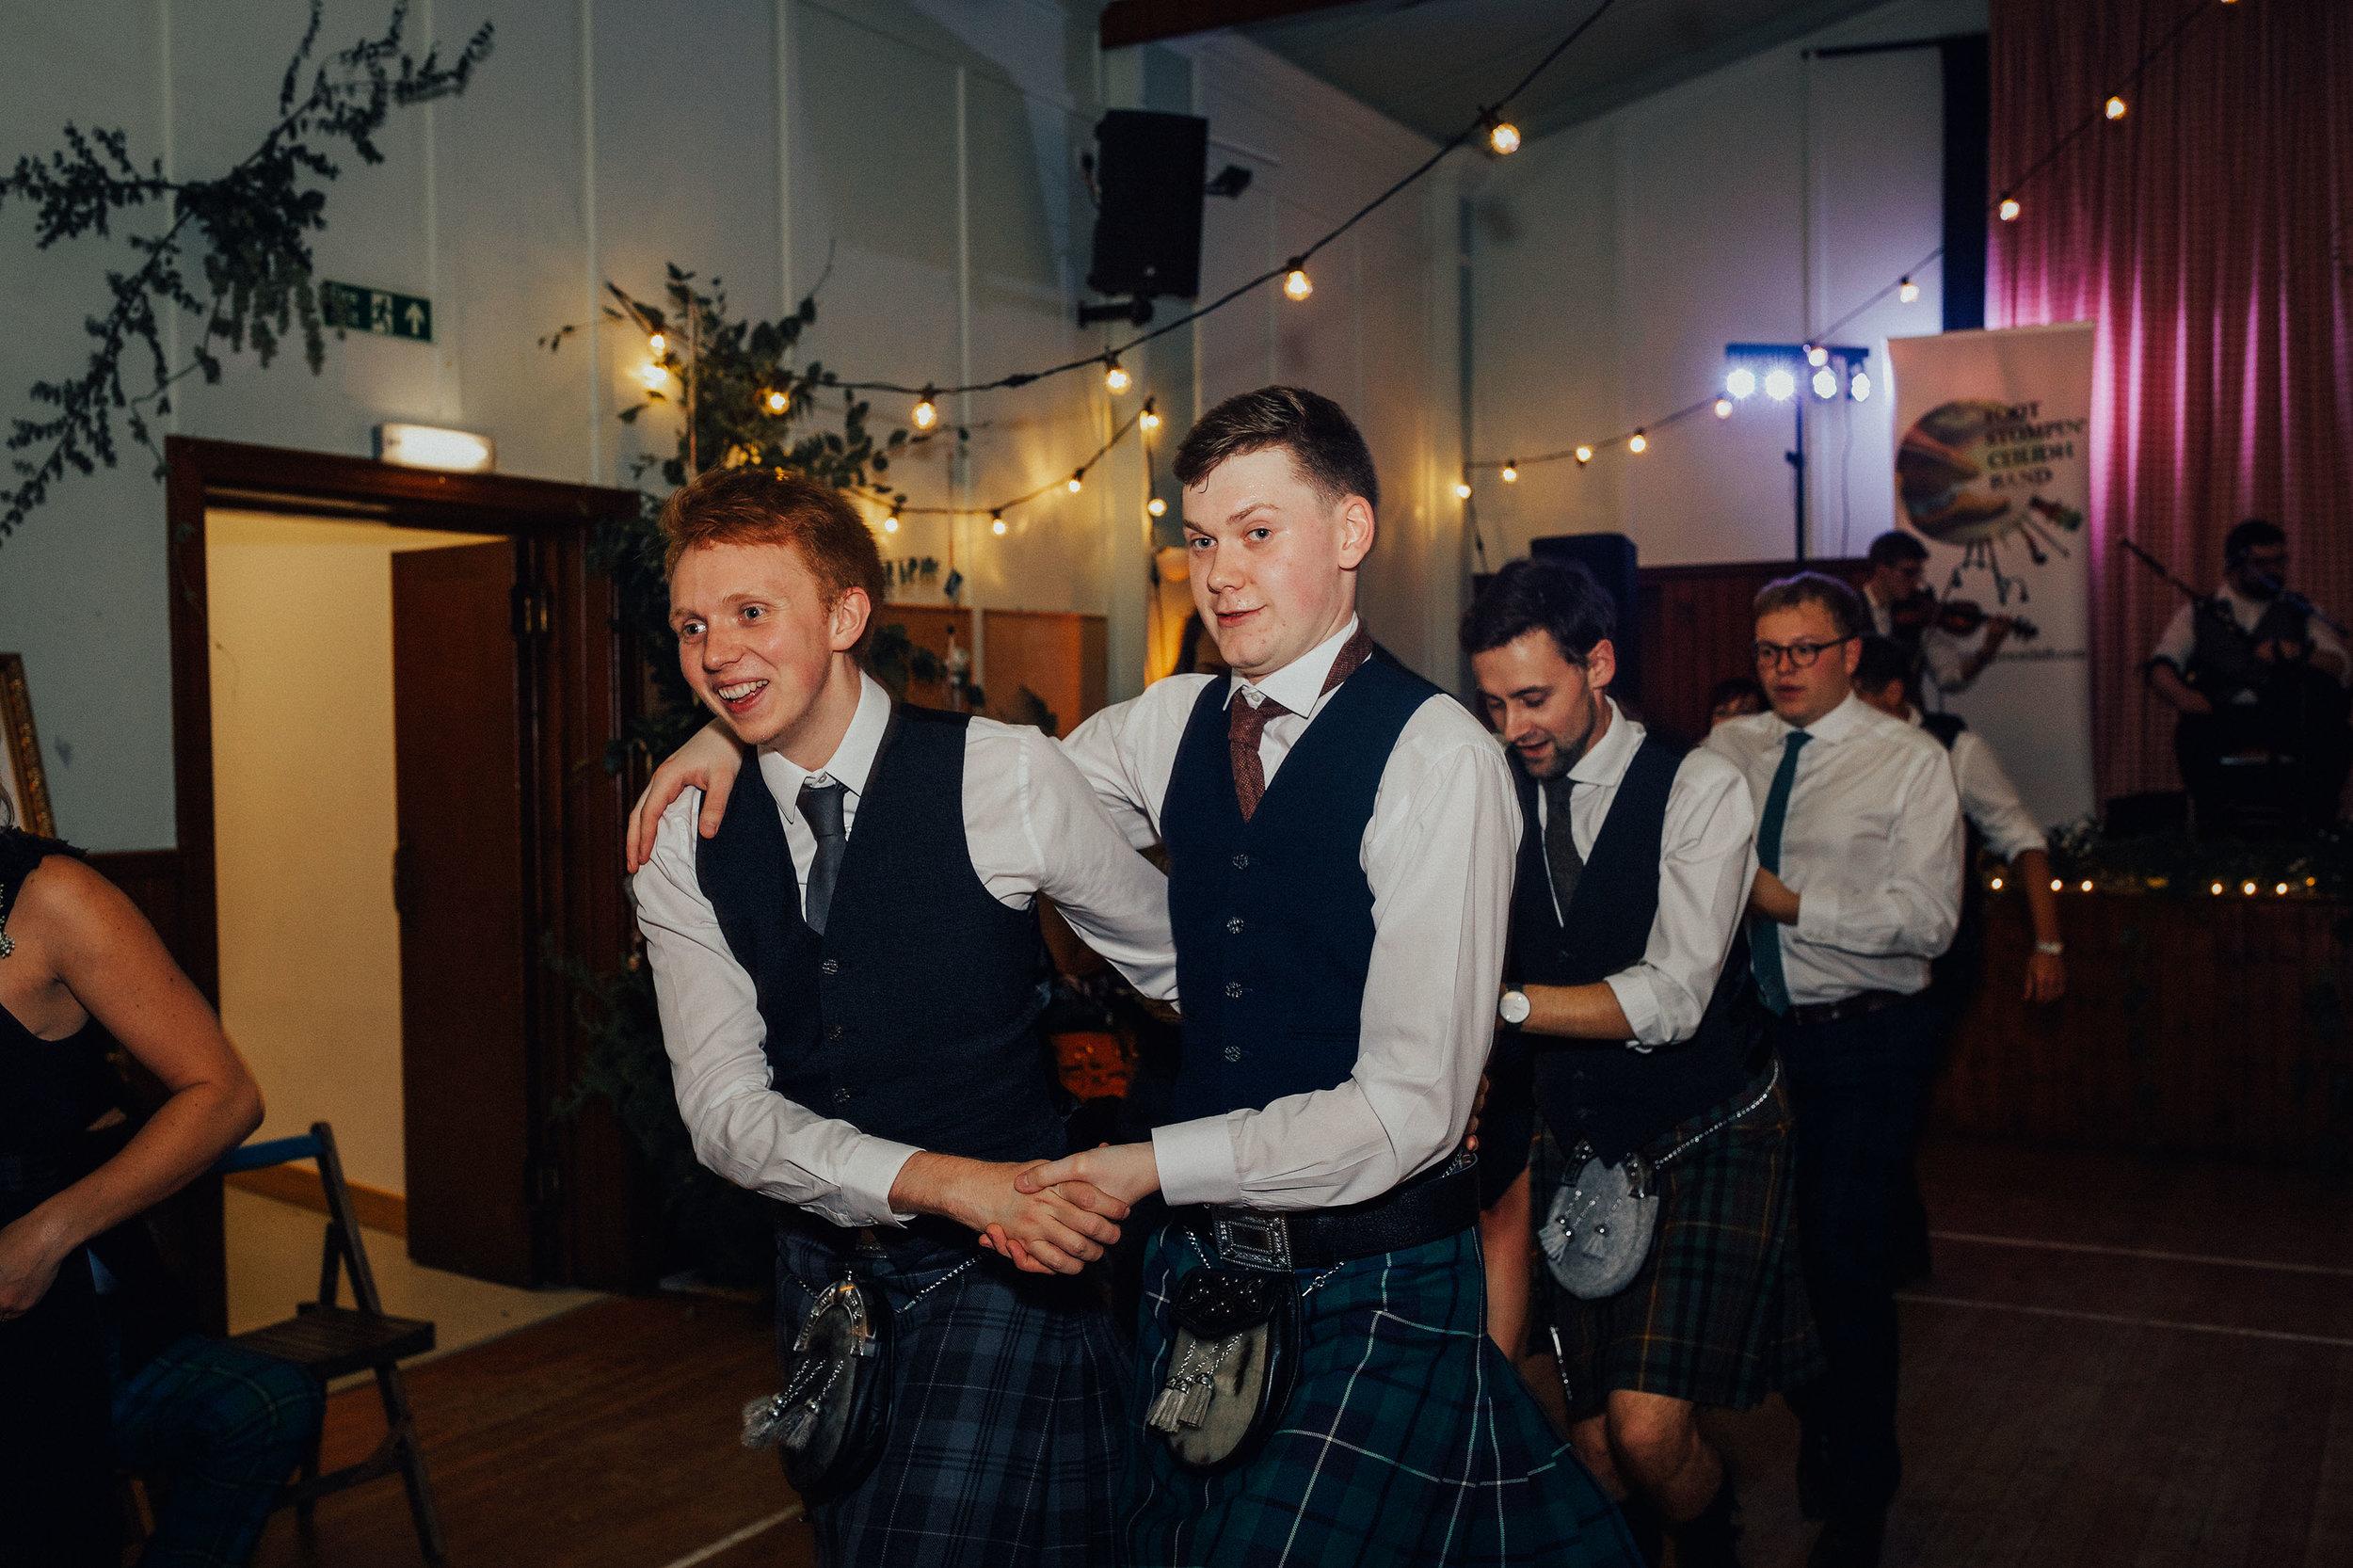 LOCH_GARTEN_DIY_WEDDING_PJ_PHILLIPS_PHOTOGRAPHY_241.jpg